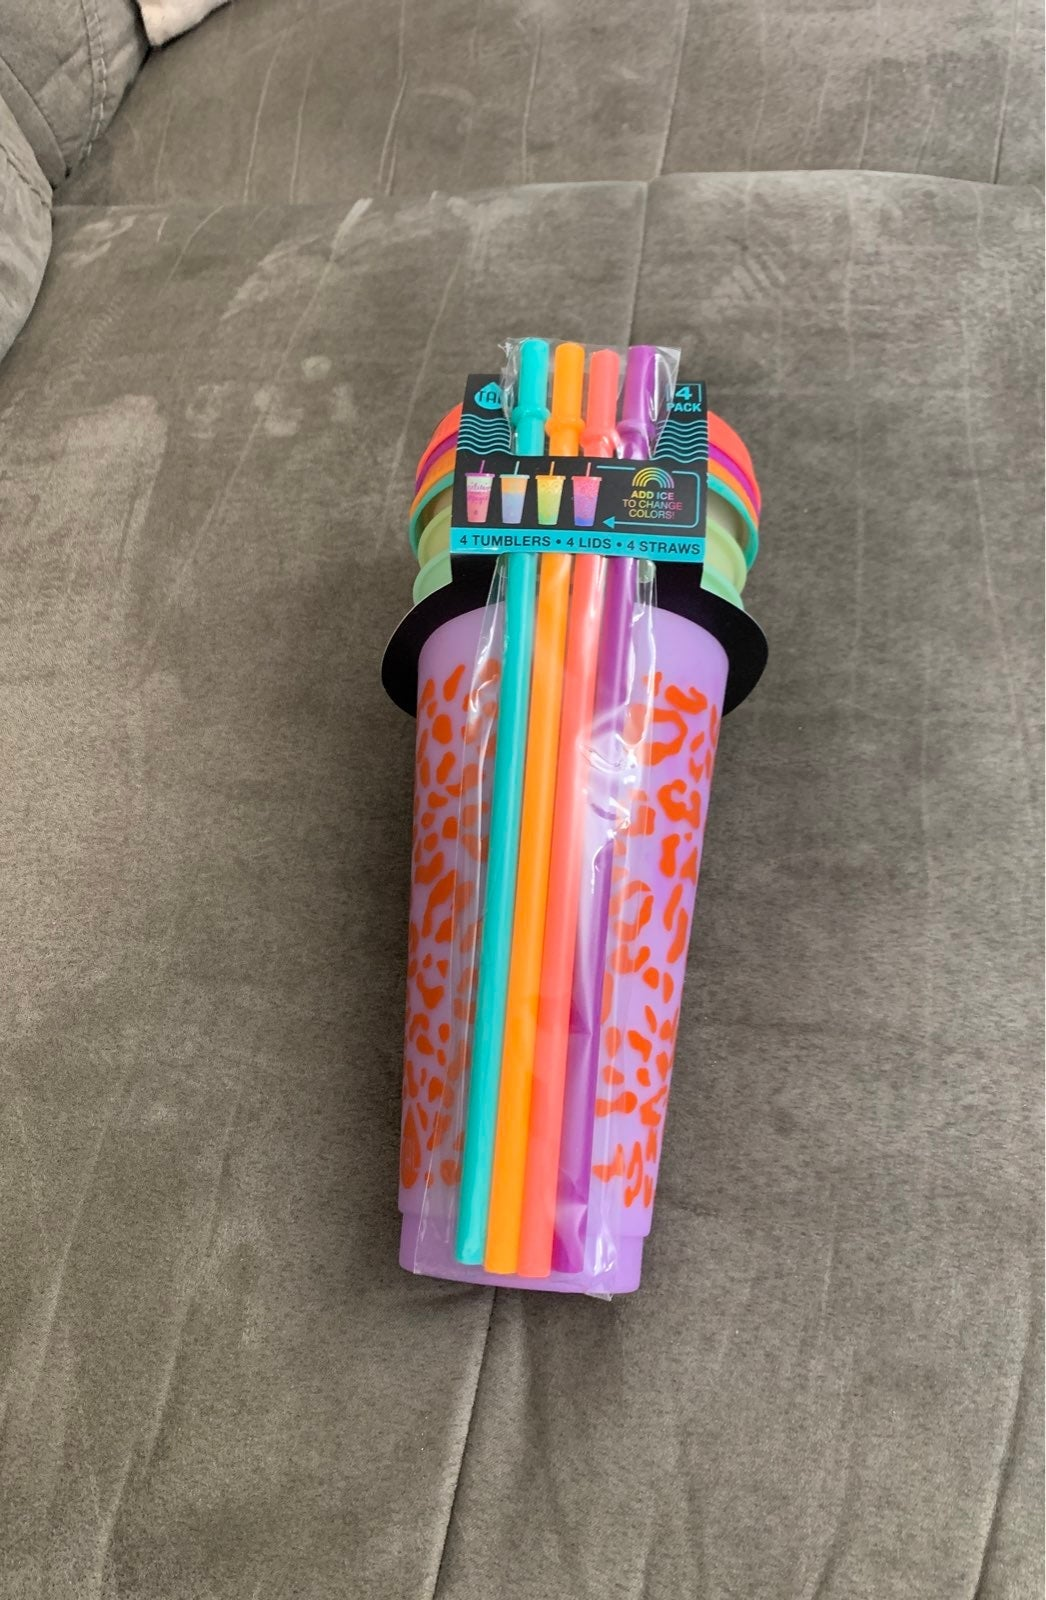 Tumbler& straw set- color changing